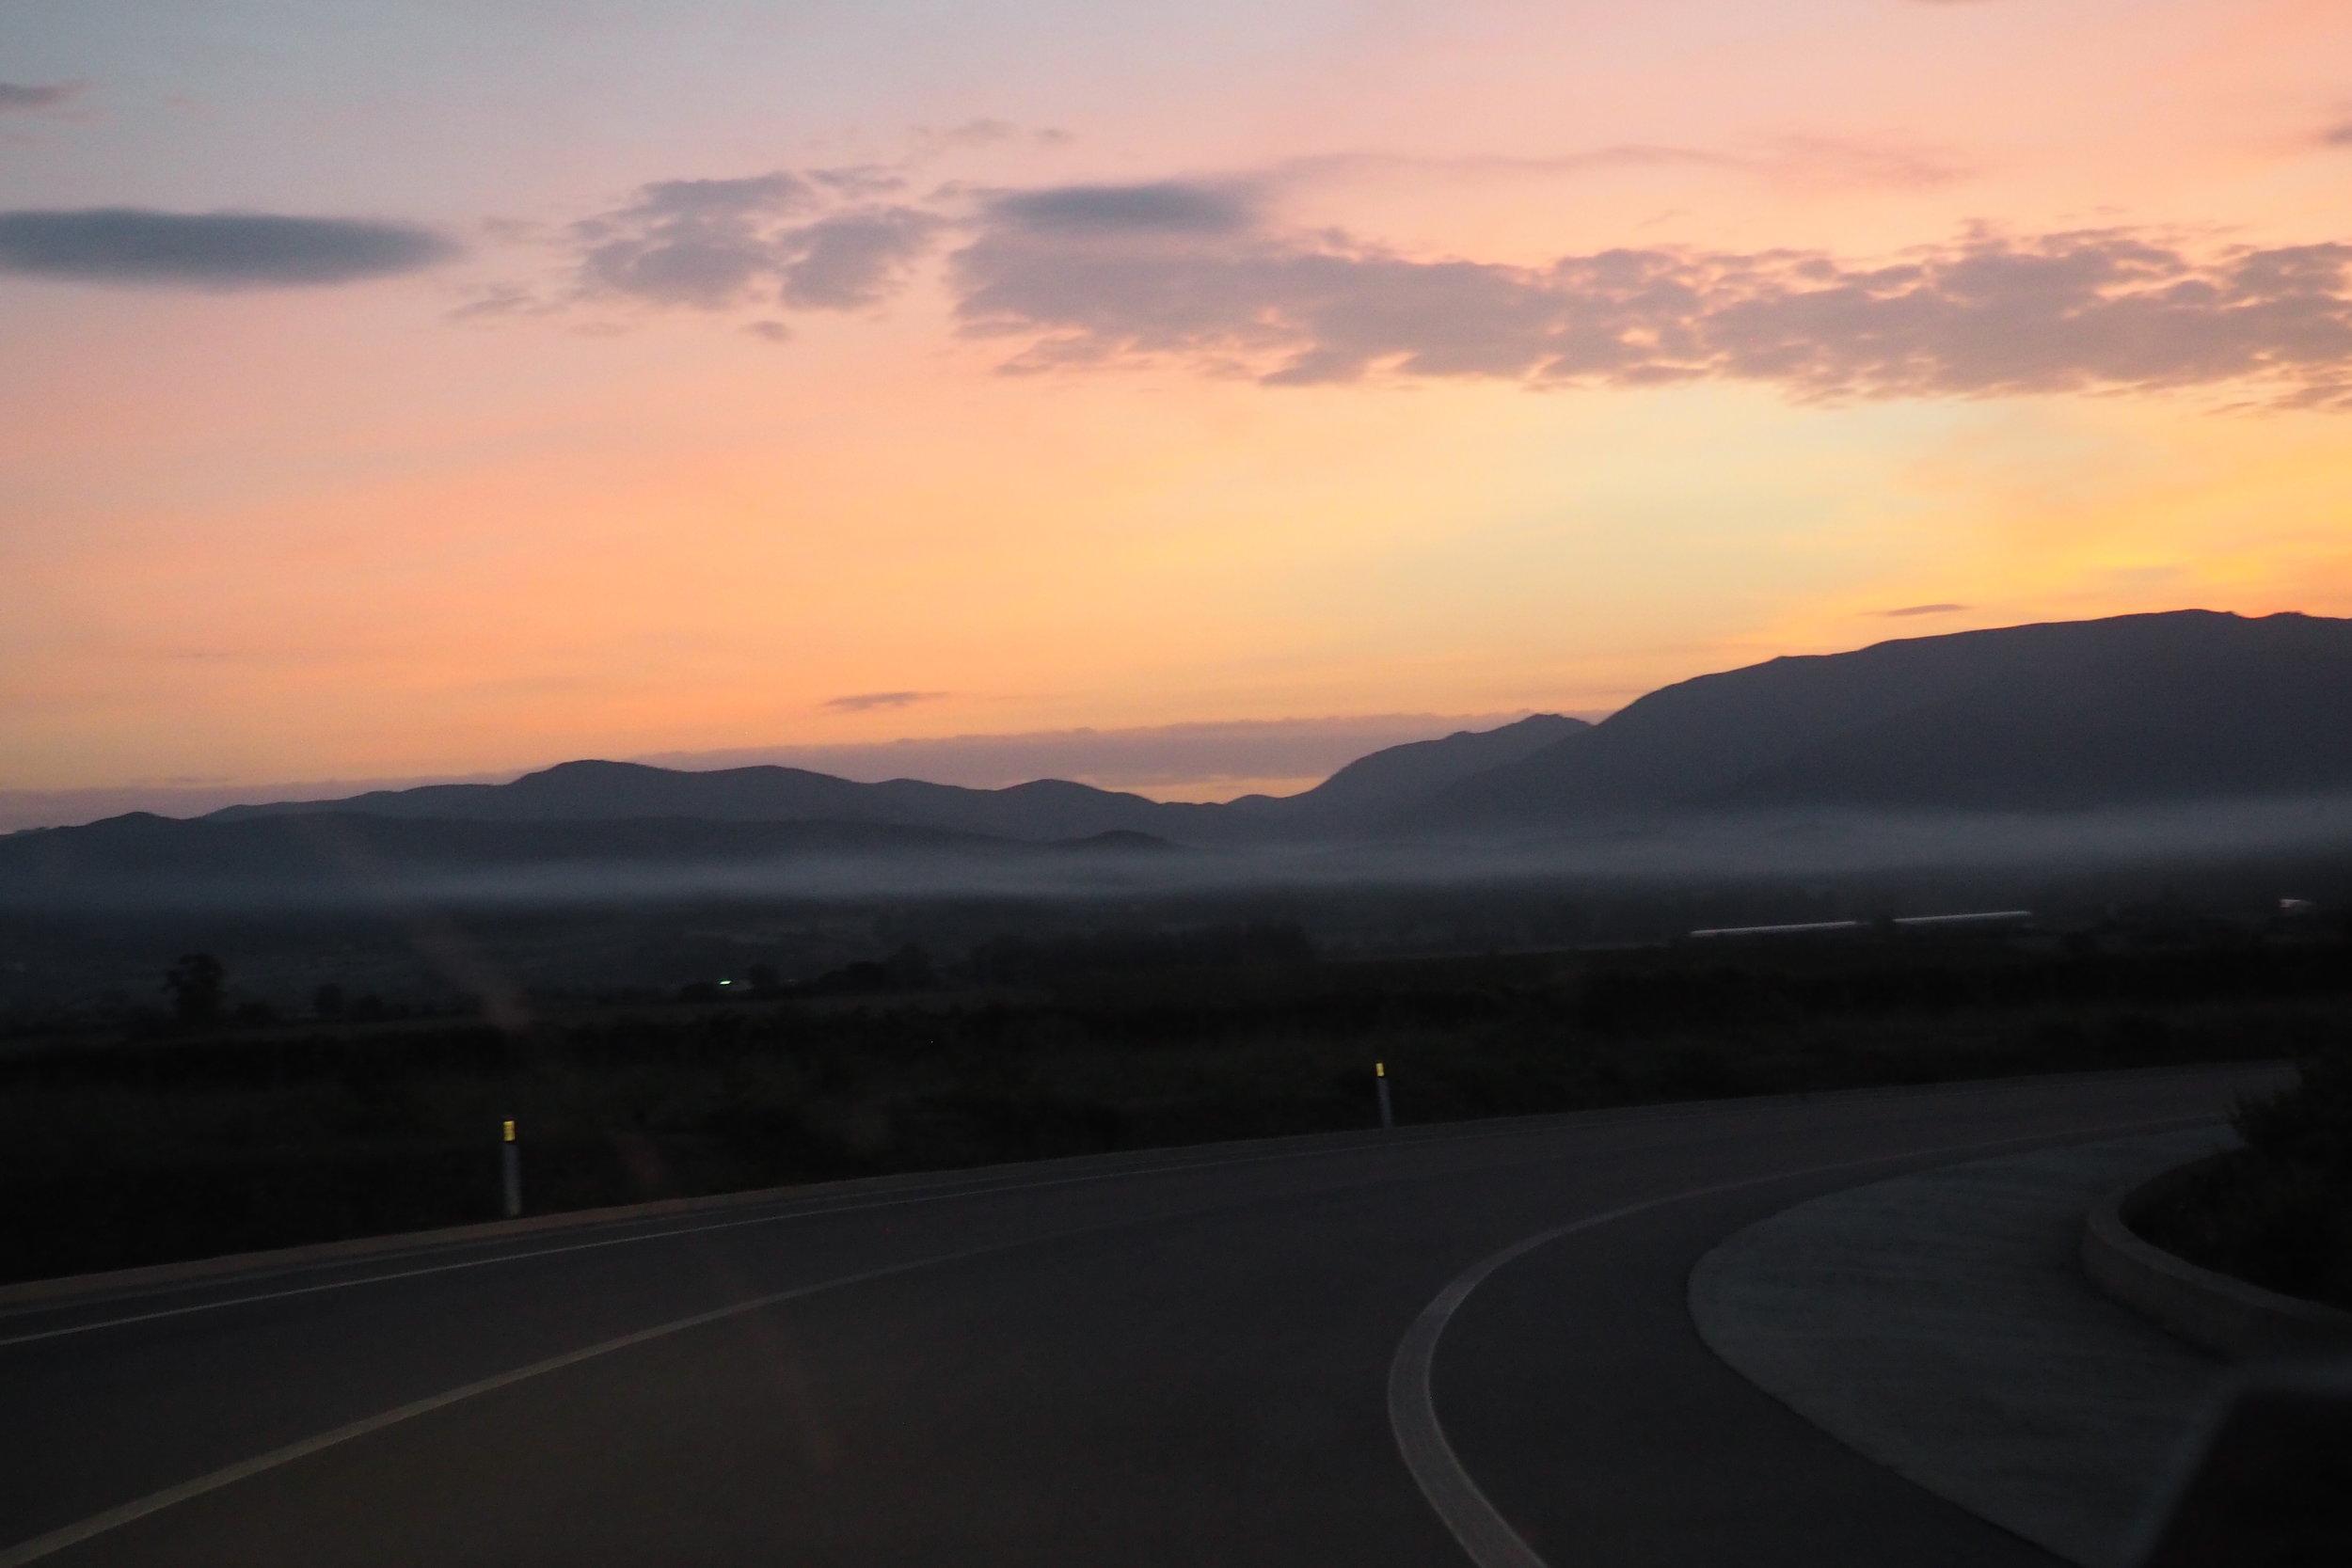 Sunrise on the way to Cagliari